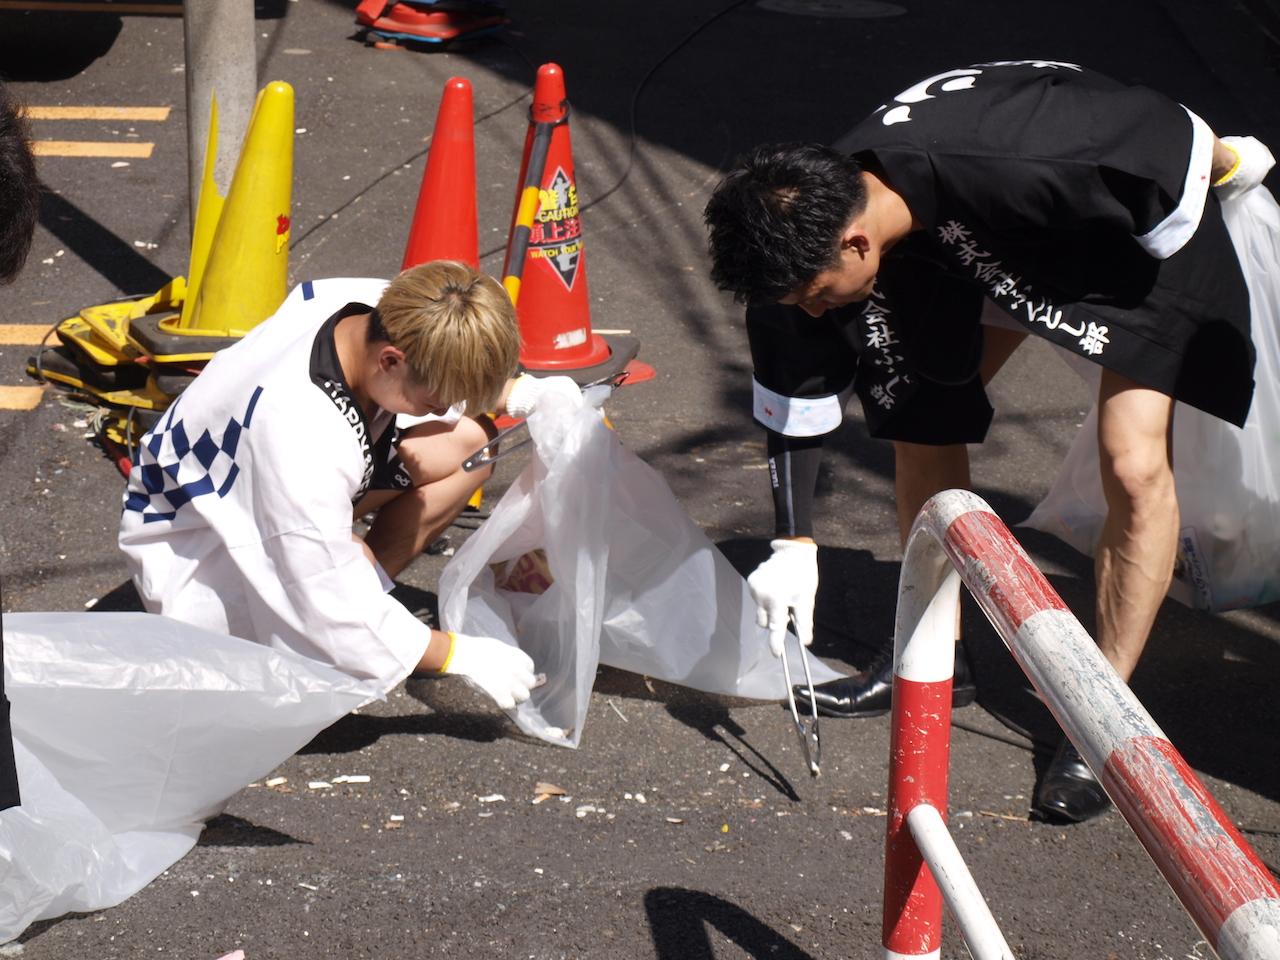 fundoshi-cleaning-yankeeintern-hassyadai-6